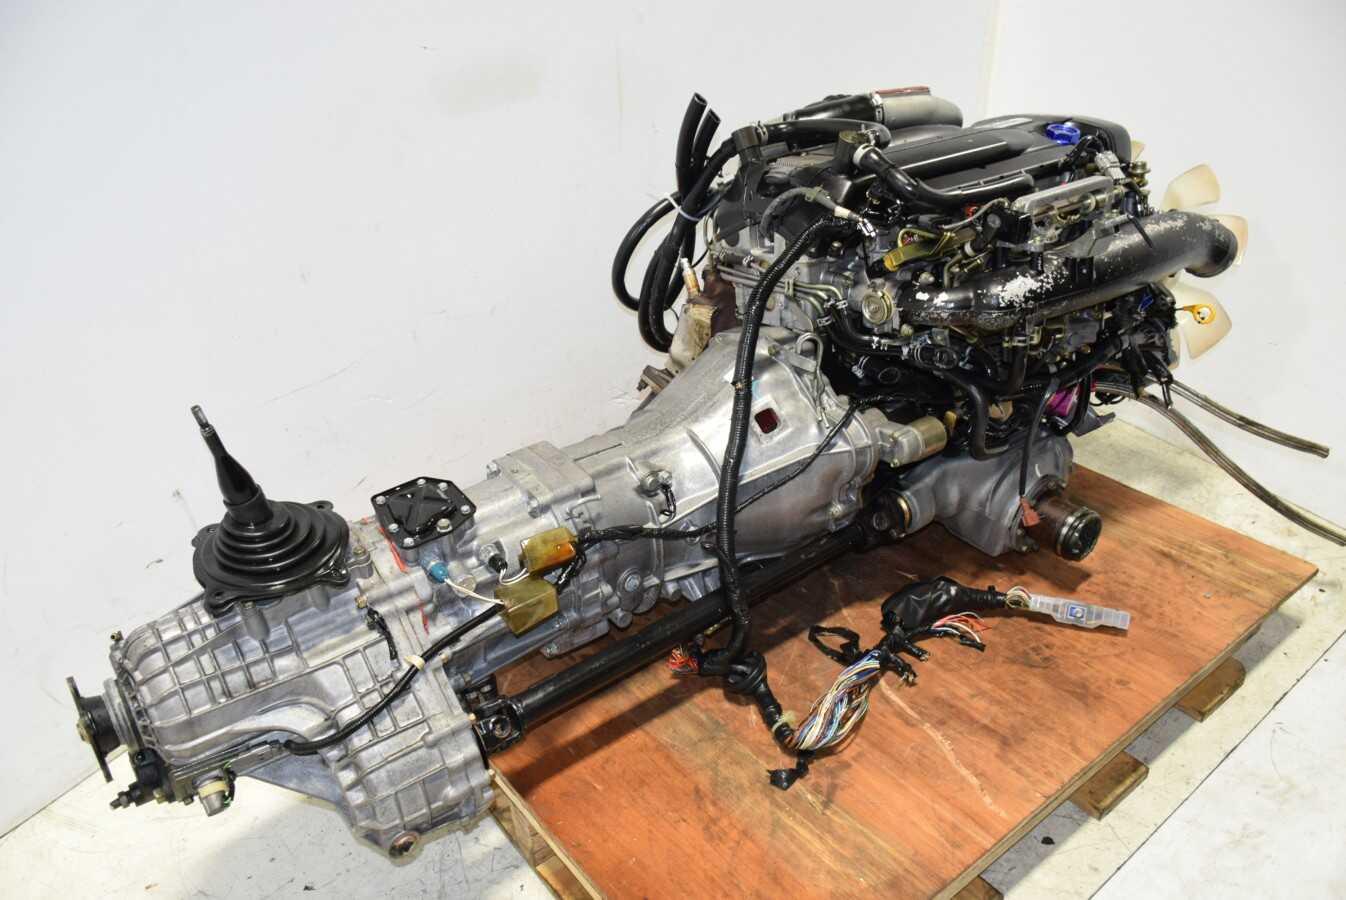 Ac Compressor Wiring Used Jdm Nissan Skyline Gtr R33 Rb26det Engine Awd